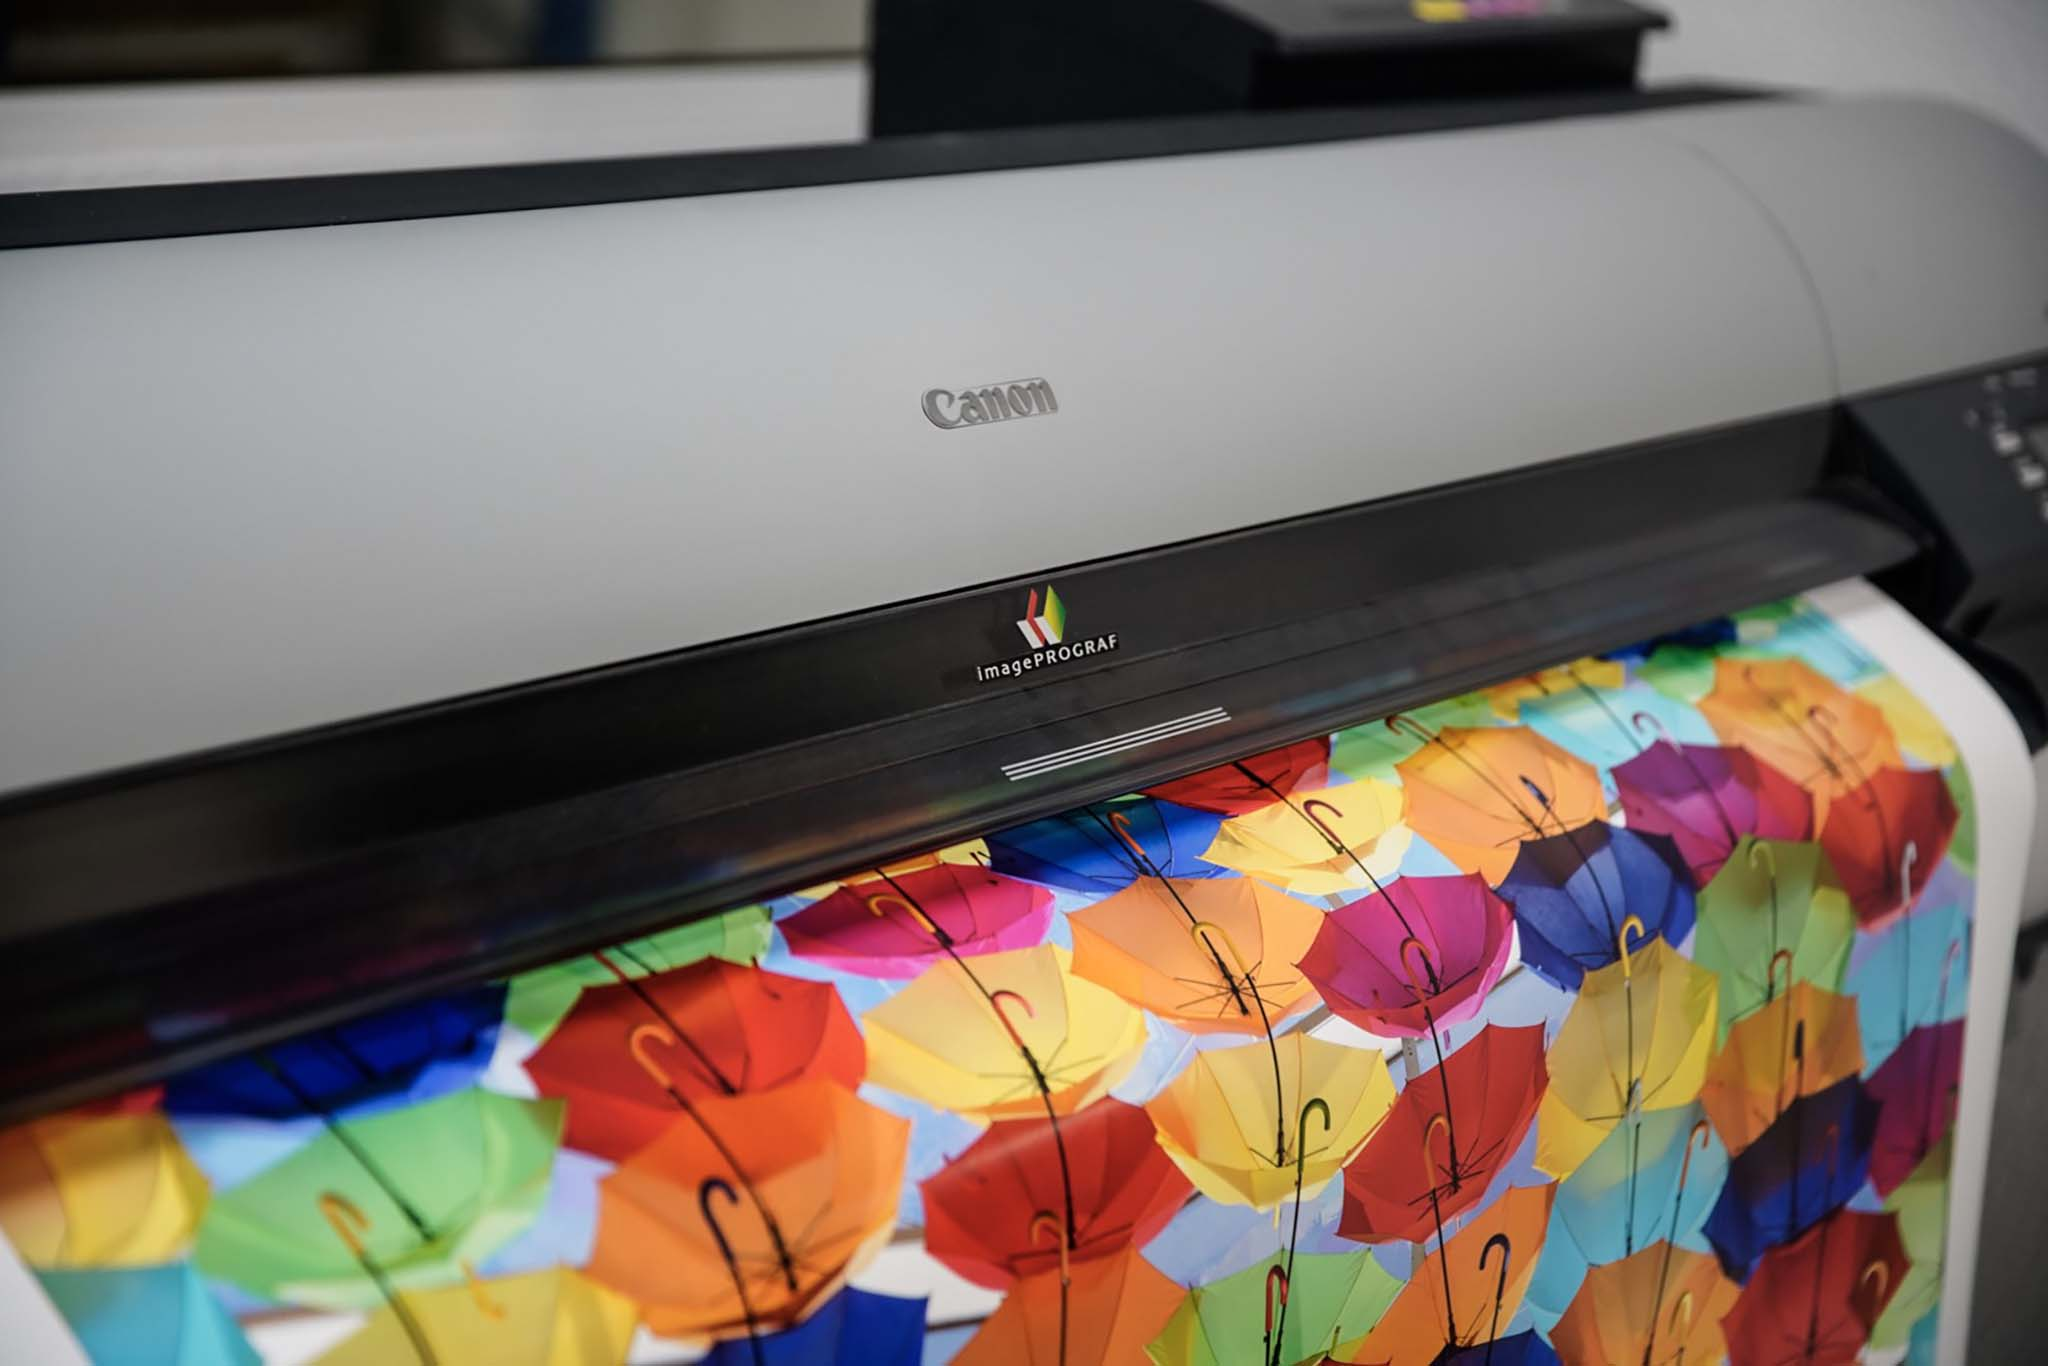 Impresora Canon cerca, imagen paraguas